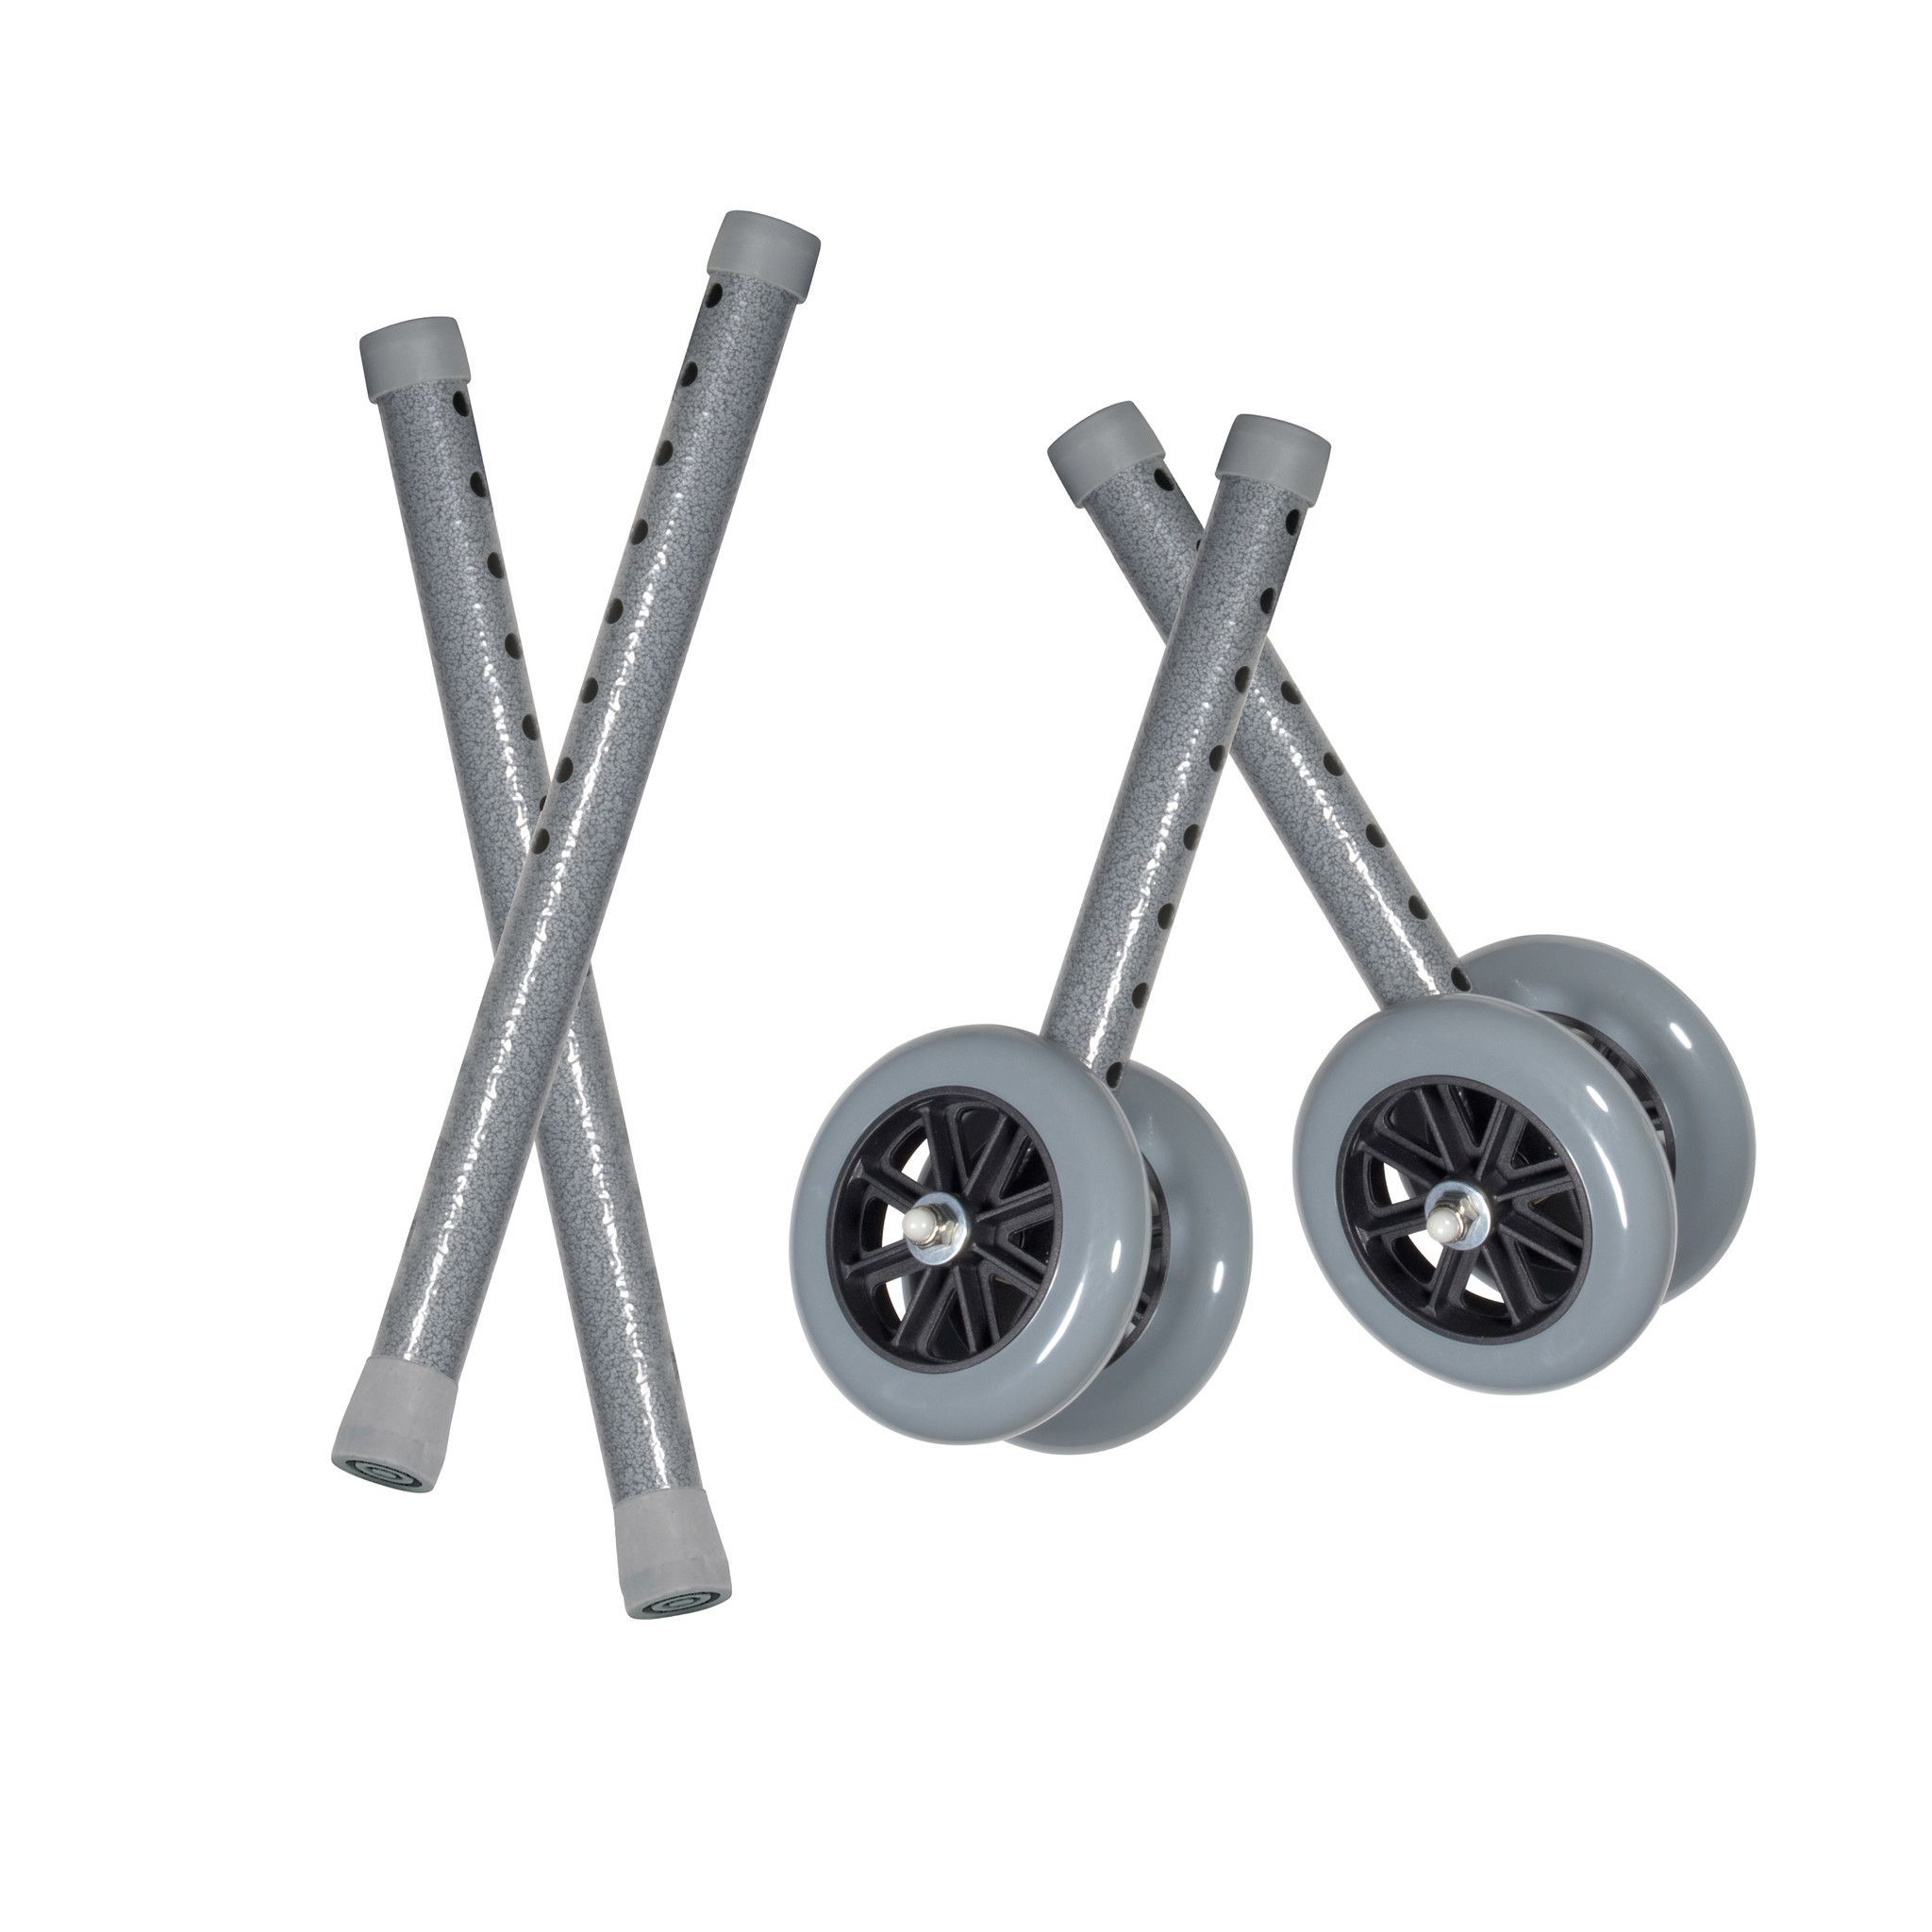 Heavy Duty Bariatric Walker Wheels With Extension Legs Heavy Duty Wheels Replacement Wheels Walker Medical